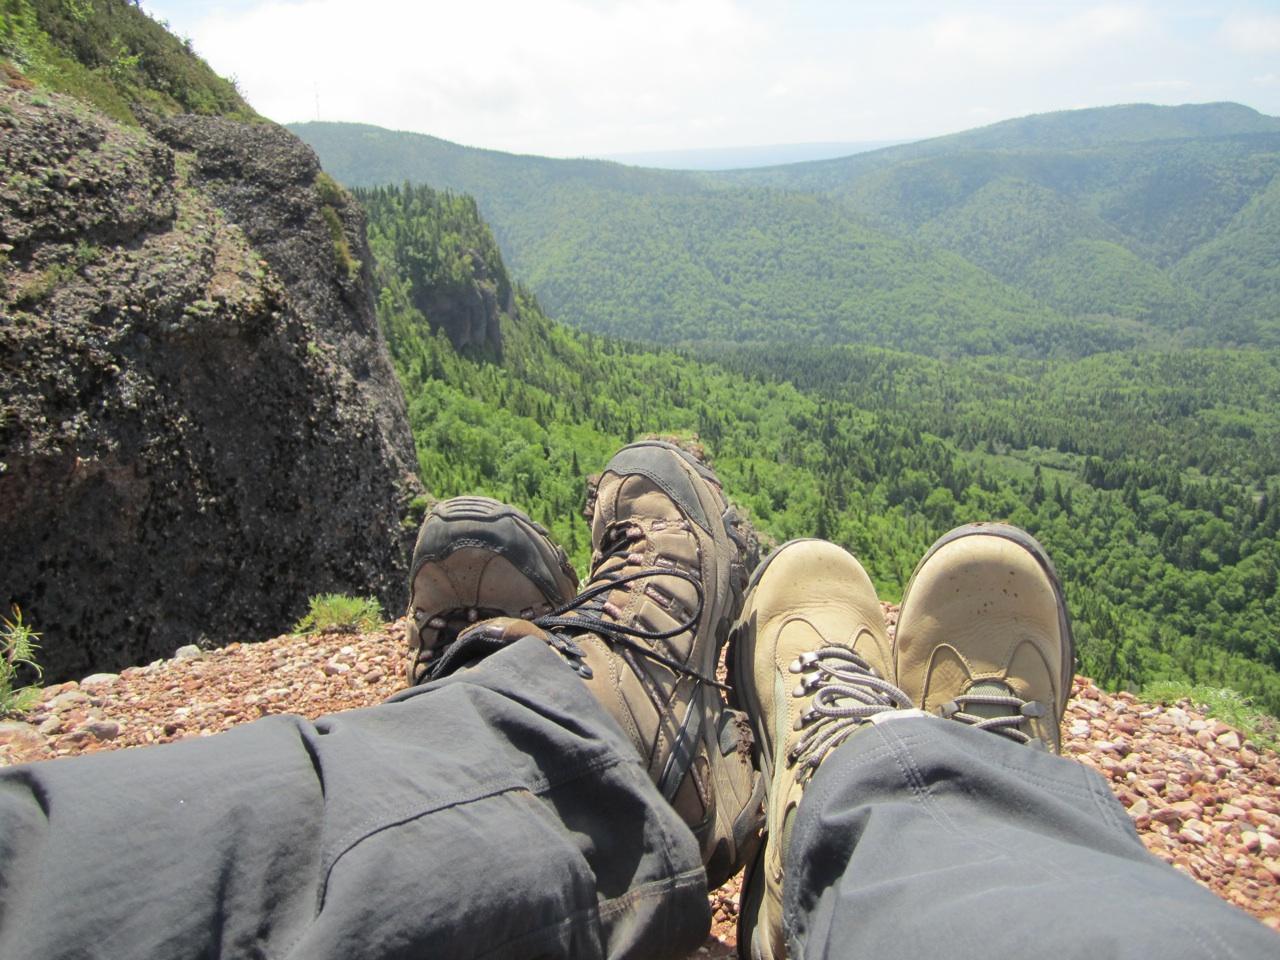 Enjoying The Scenery At The Crevasse